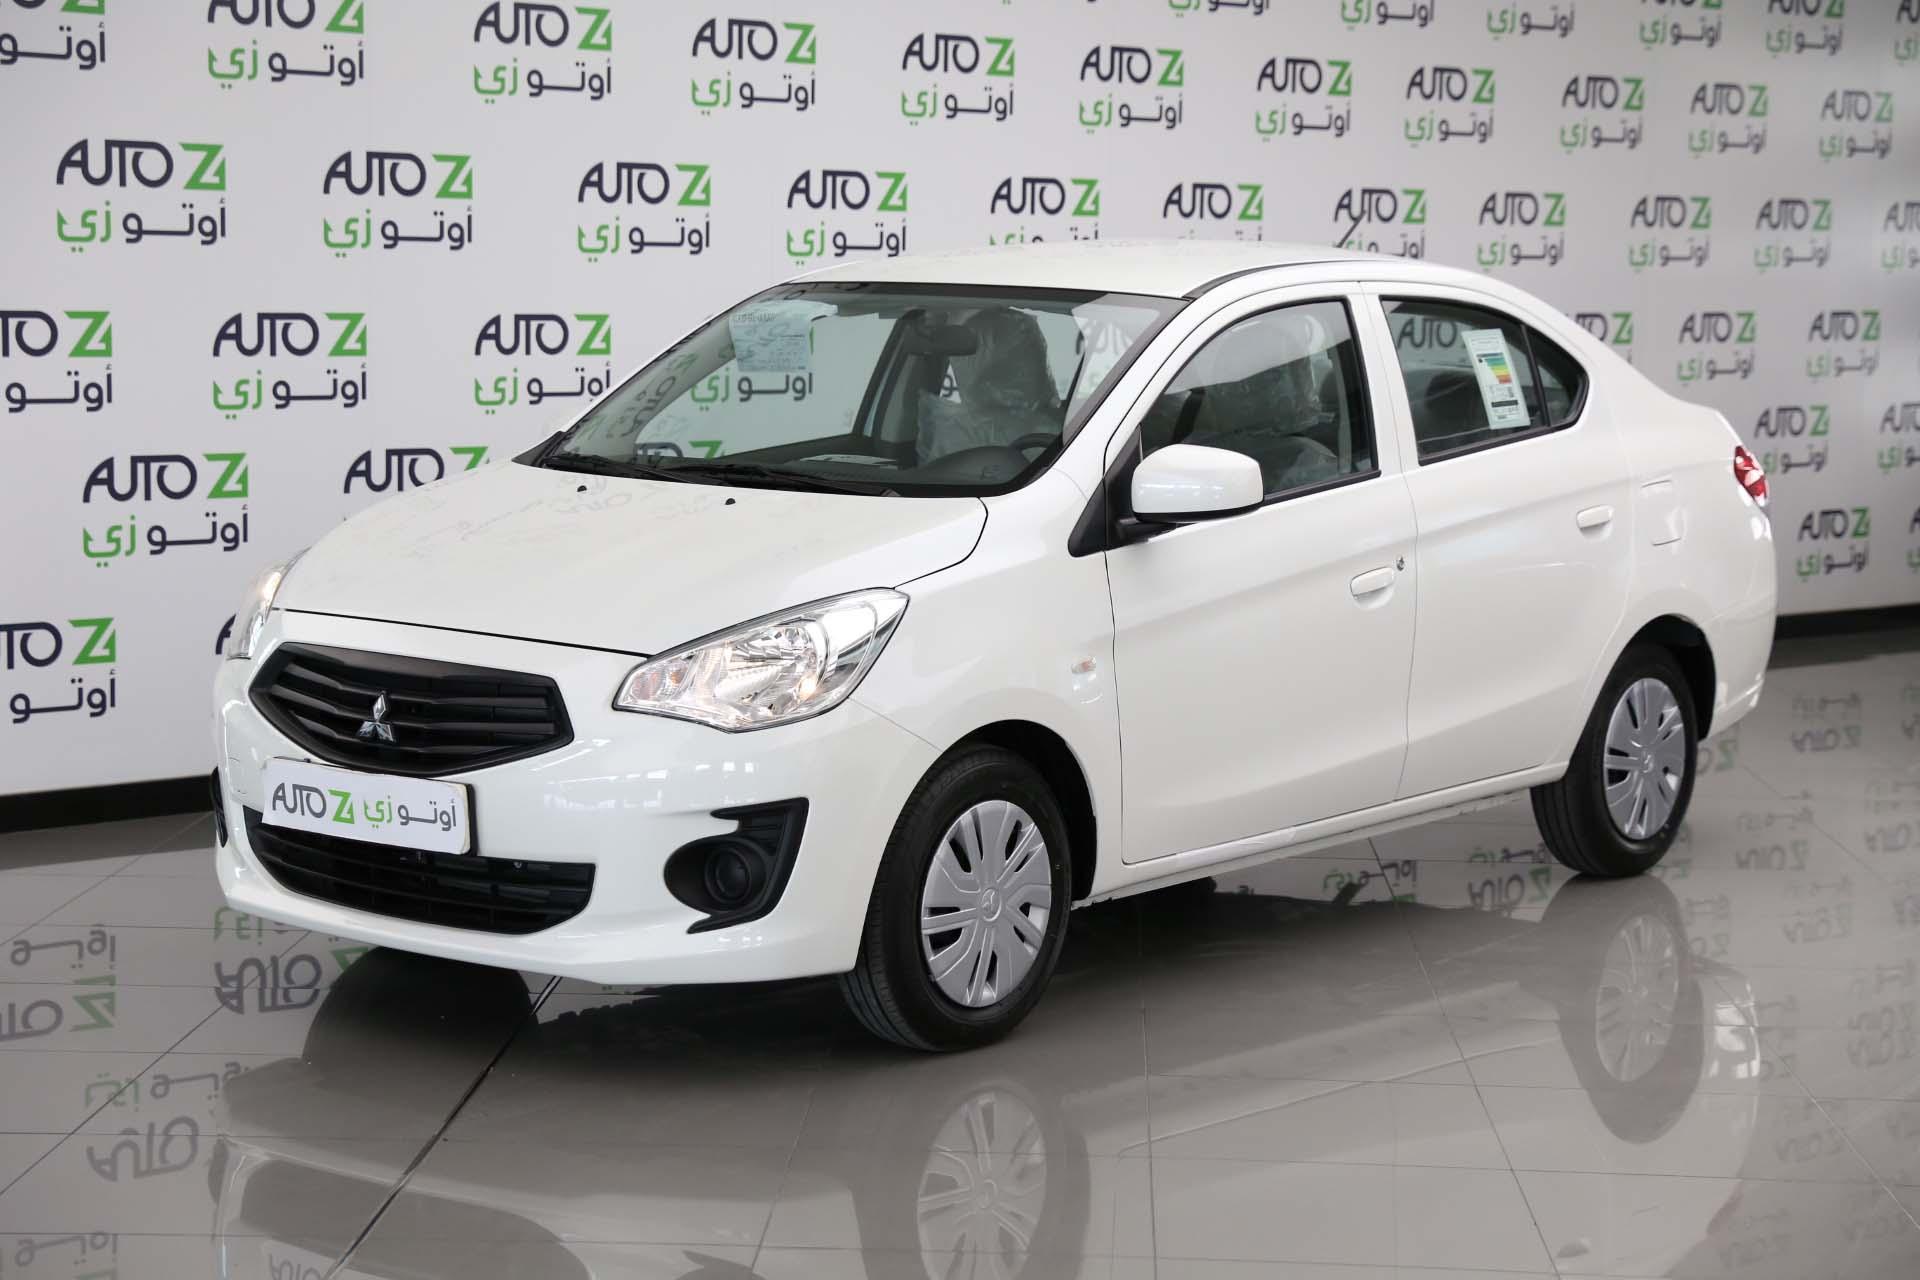 Mitsubishi Attrage 2020 Autoz Qatar